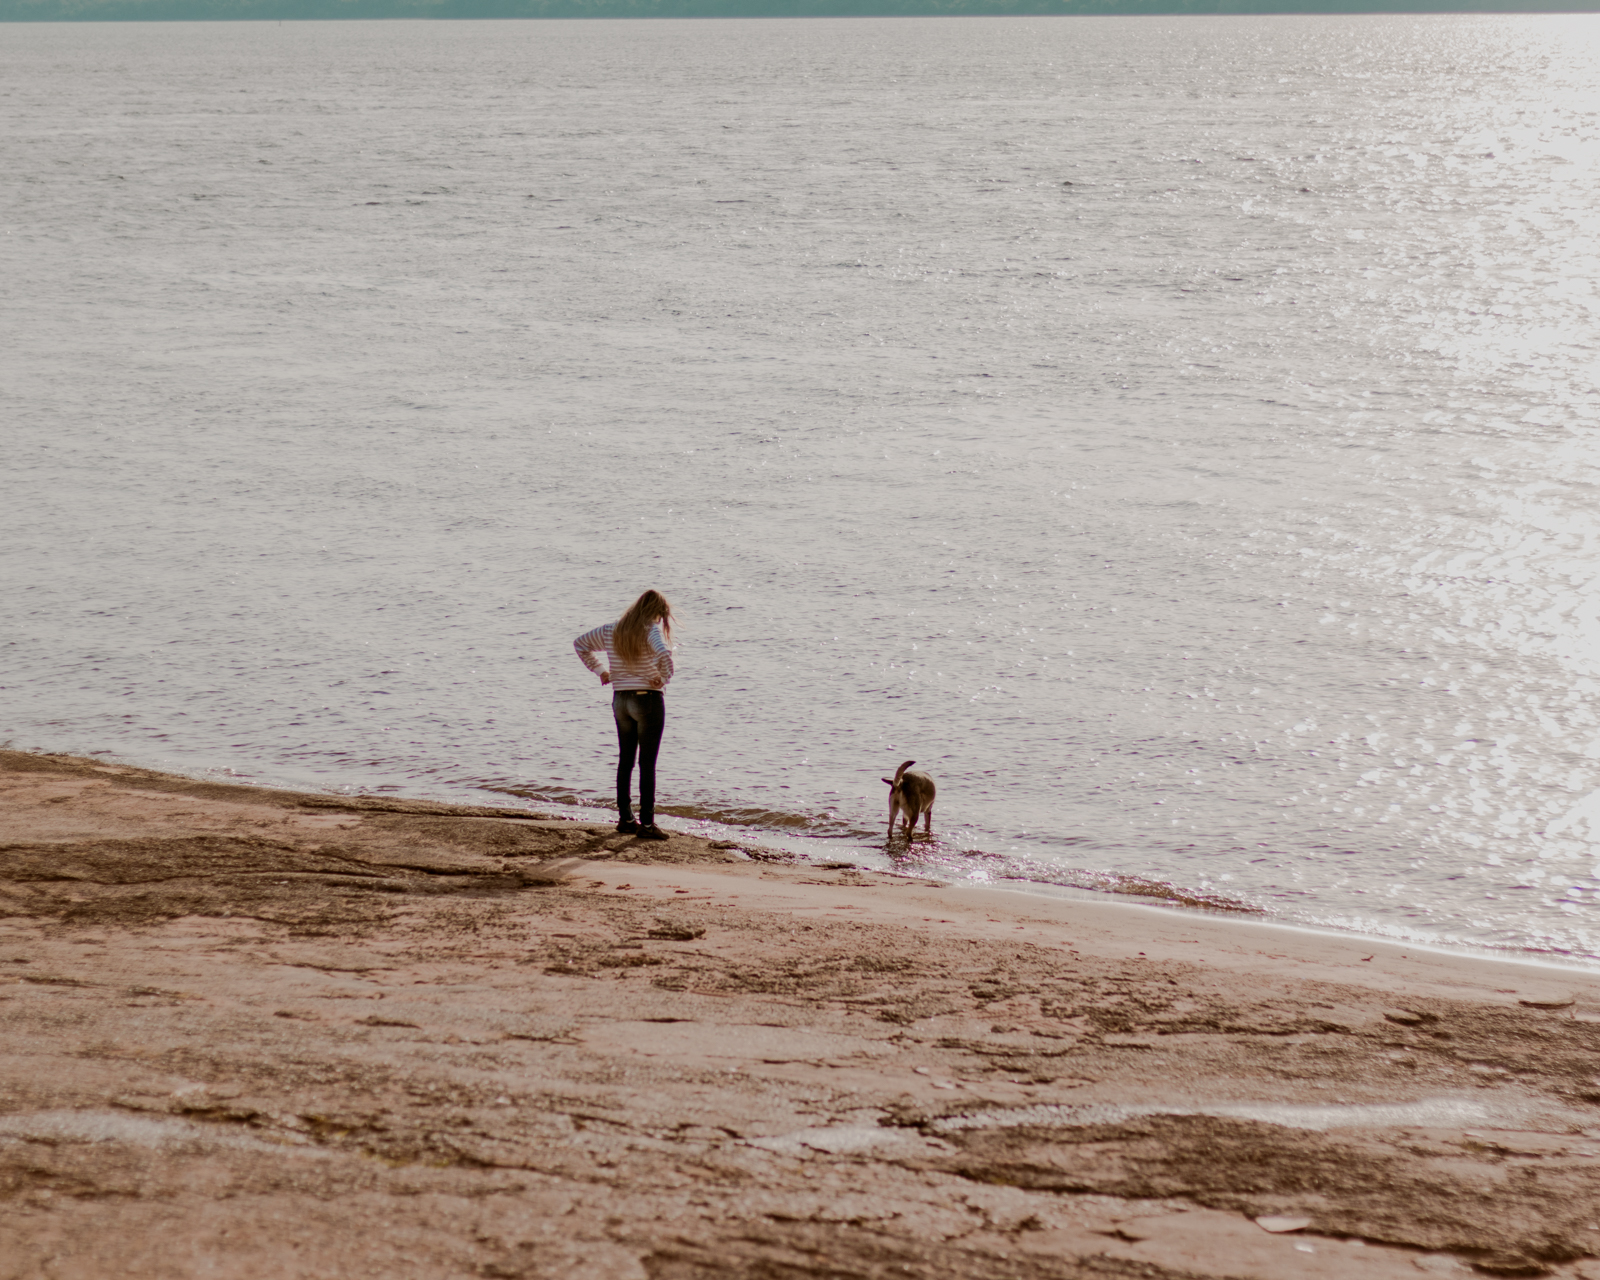 menina e cachorro andando na praia